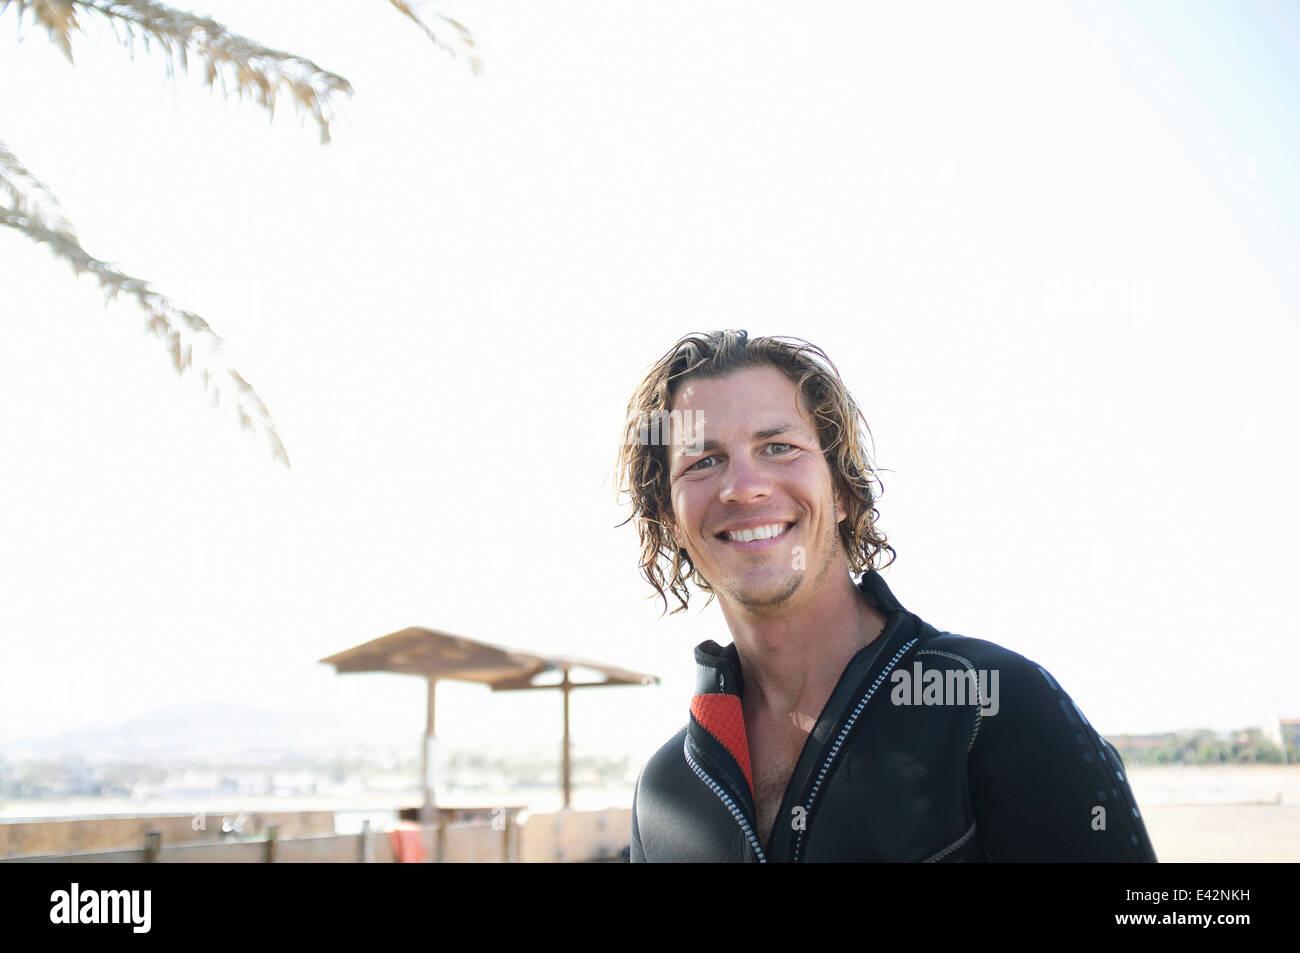 Portrait of mid adult male scuba diver on beach Photo Stock